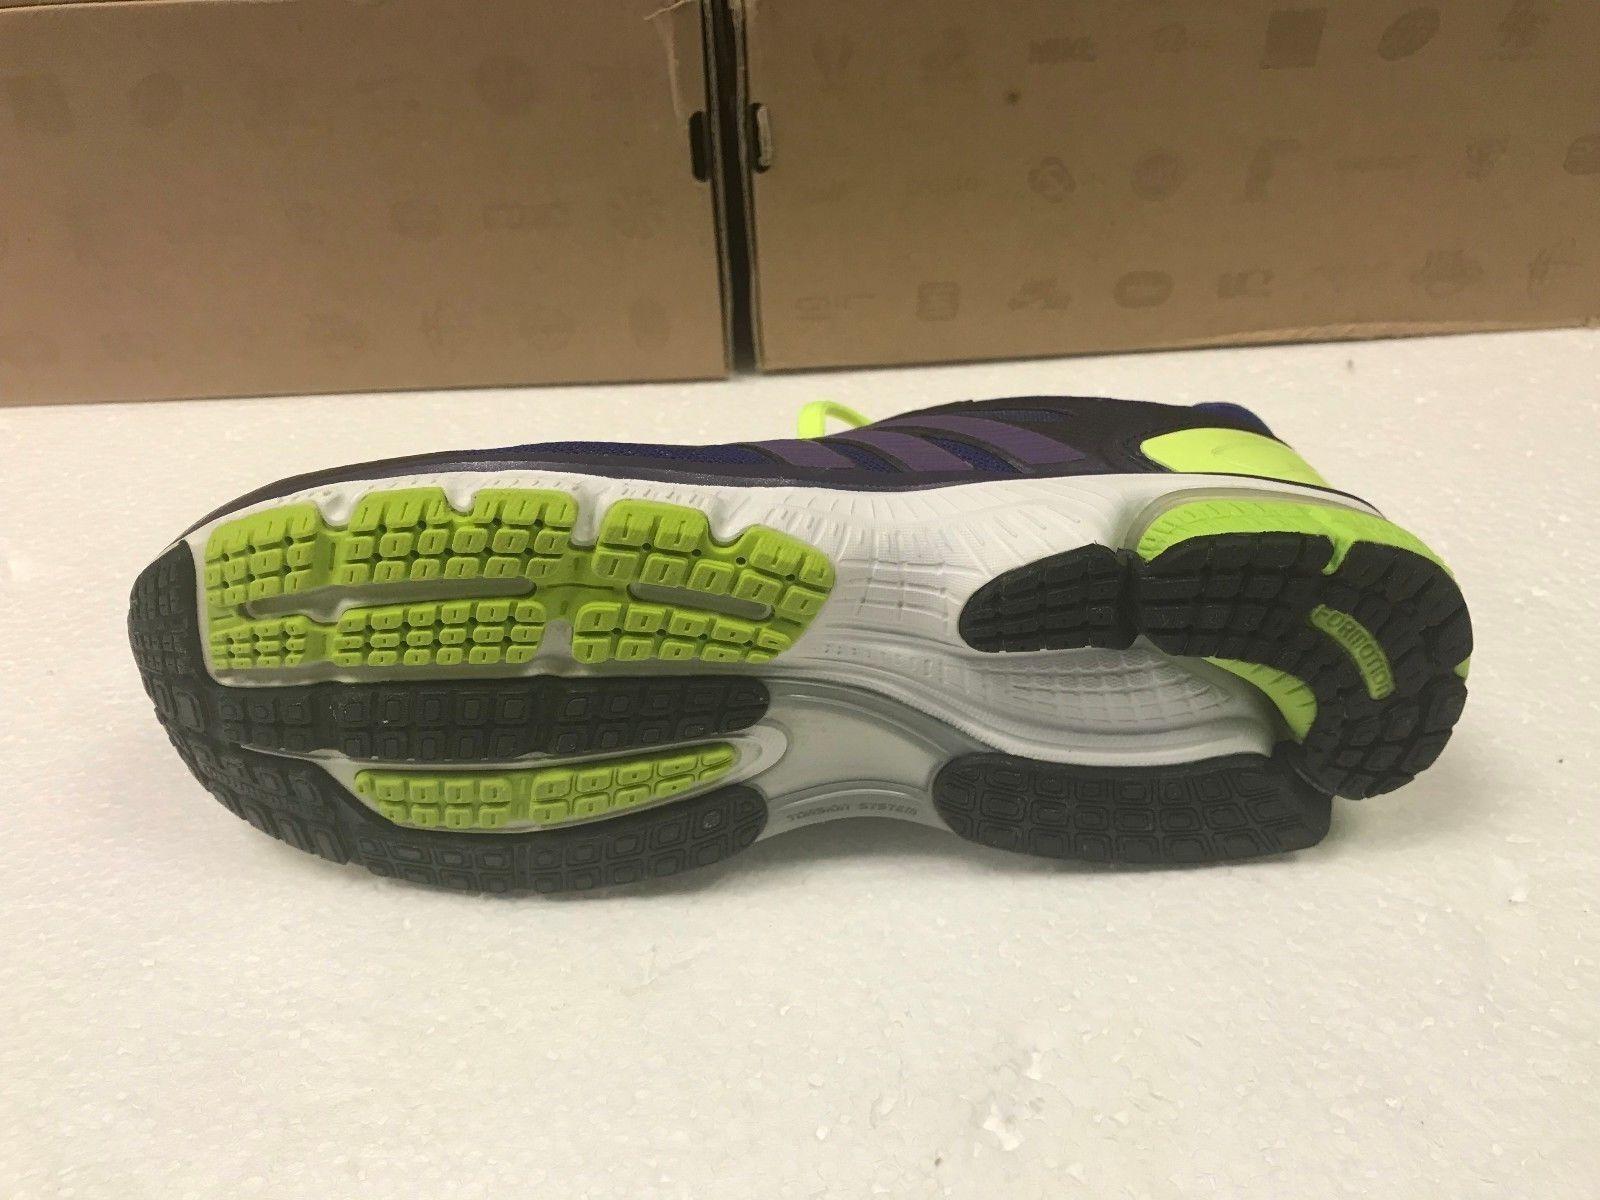 neues womens adidas supernova - 6 sequenz 6 turnschuhe g97480-shoes-size 6 - c00dc8